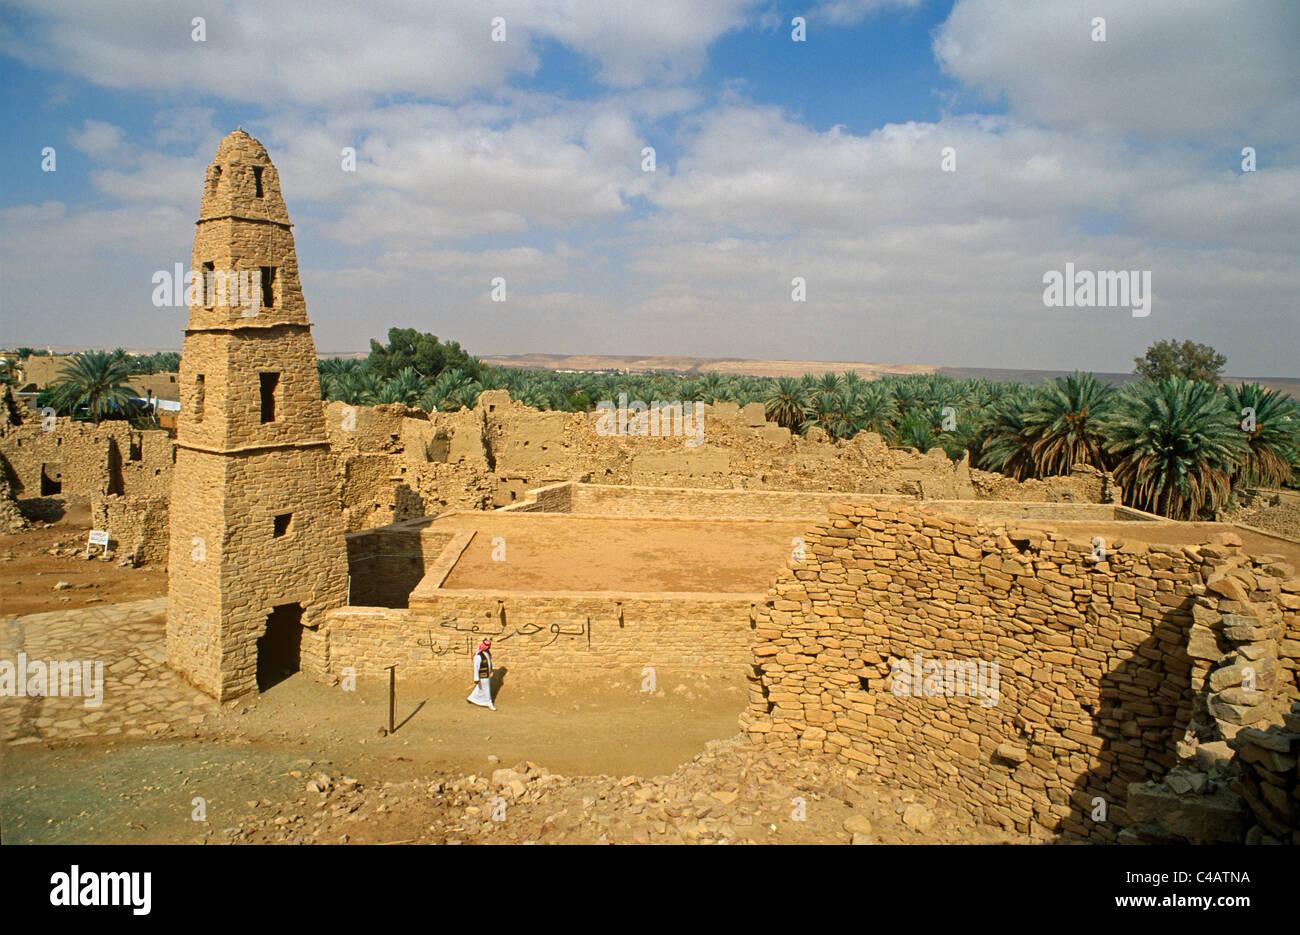 Saudi Arabia, Jouf, Domat al-Jandal. Standing alongside the ruined mud-brik remains of old Domat al-Jandal Stock Photo